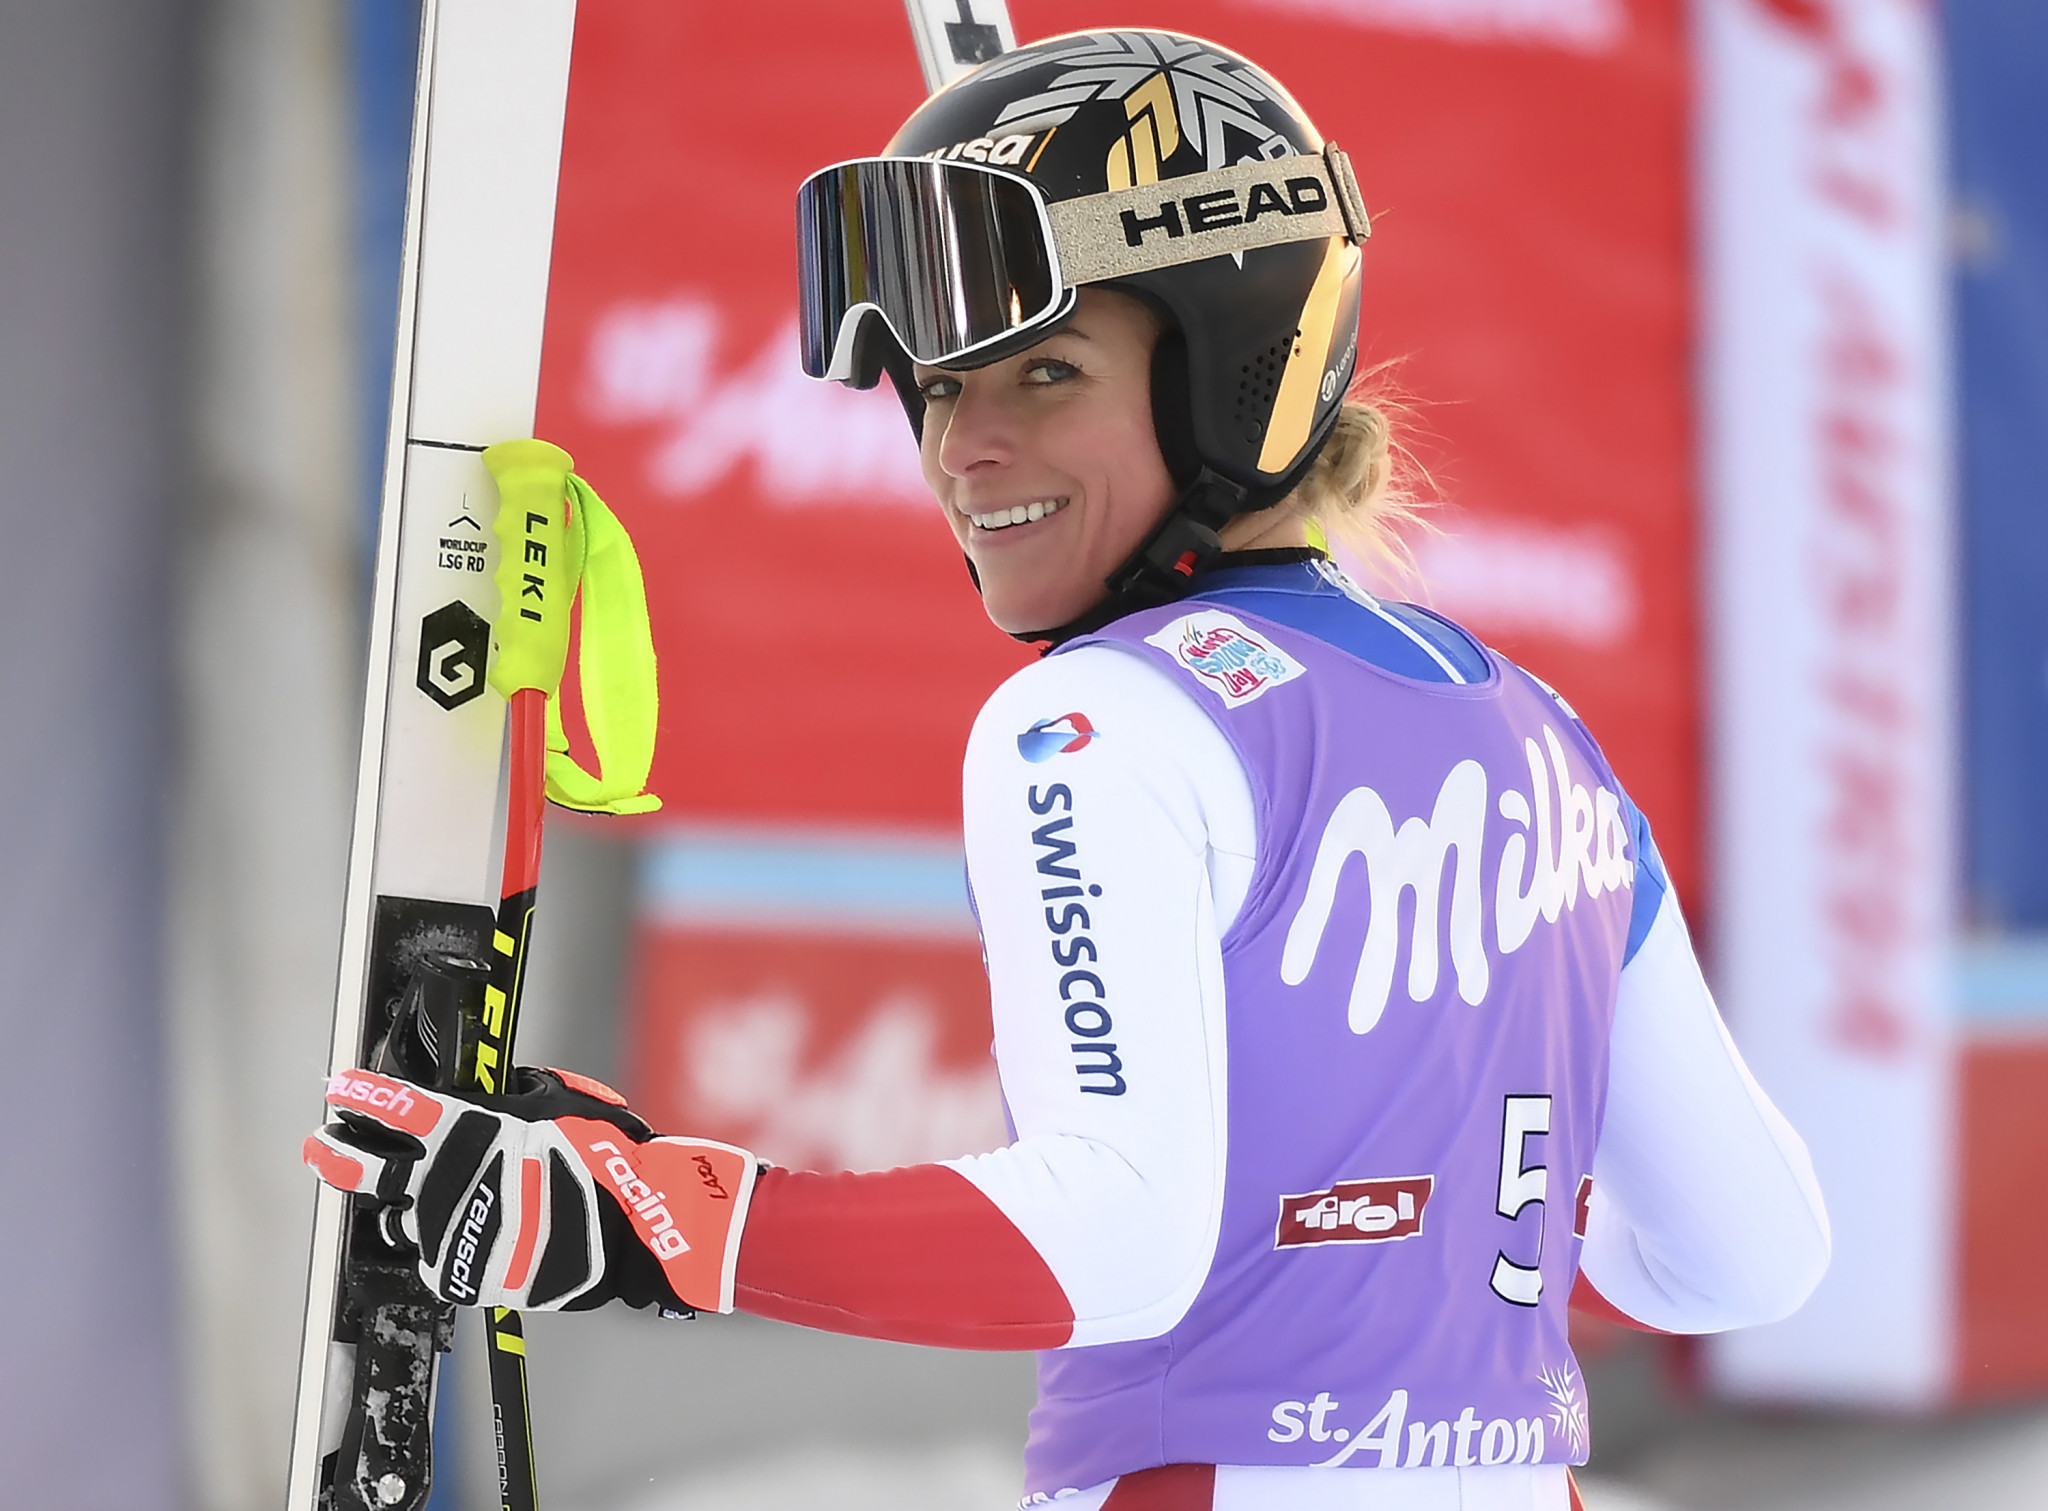 Gut-Behrami tops FIS Alpine Ski World Cup super-G standings after St Anton win